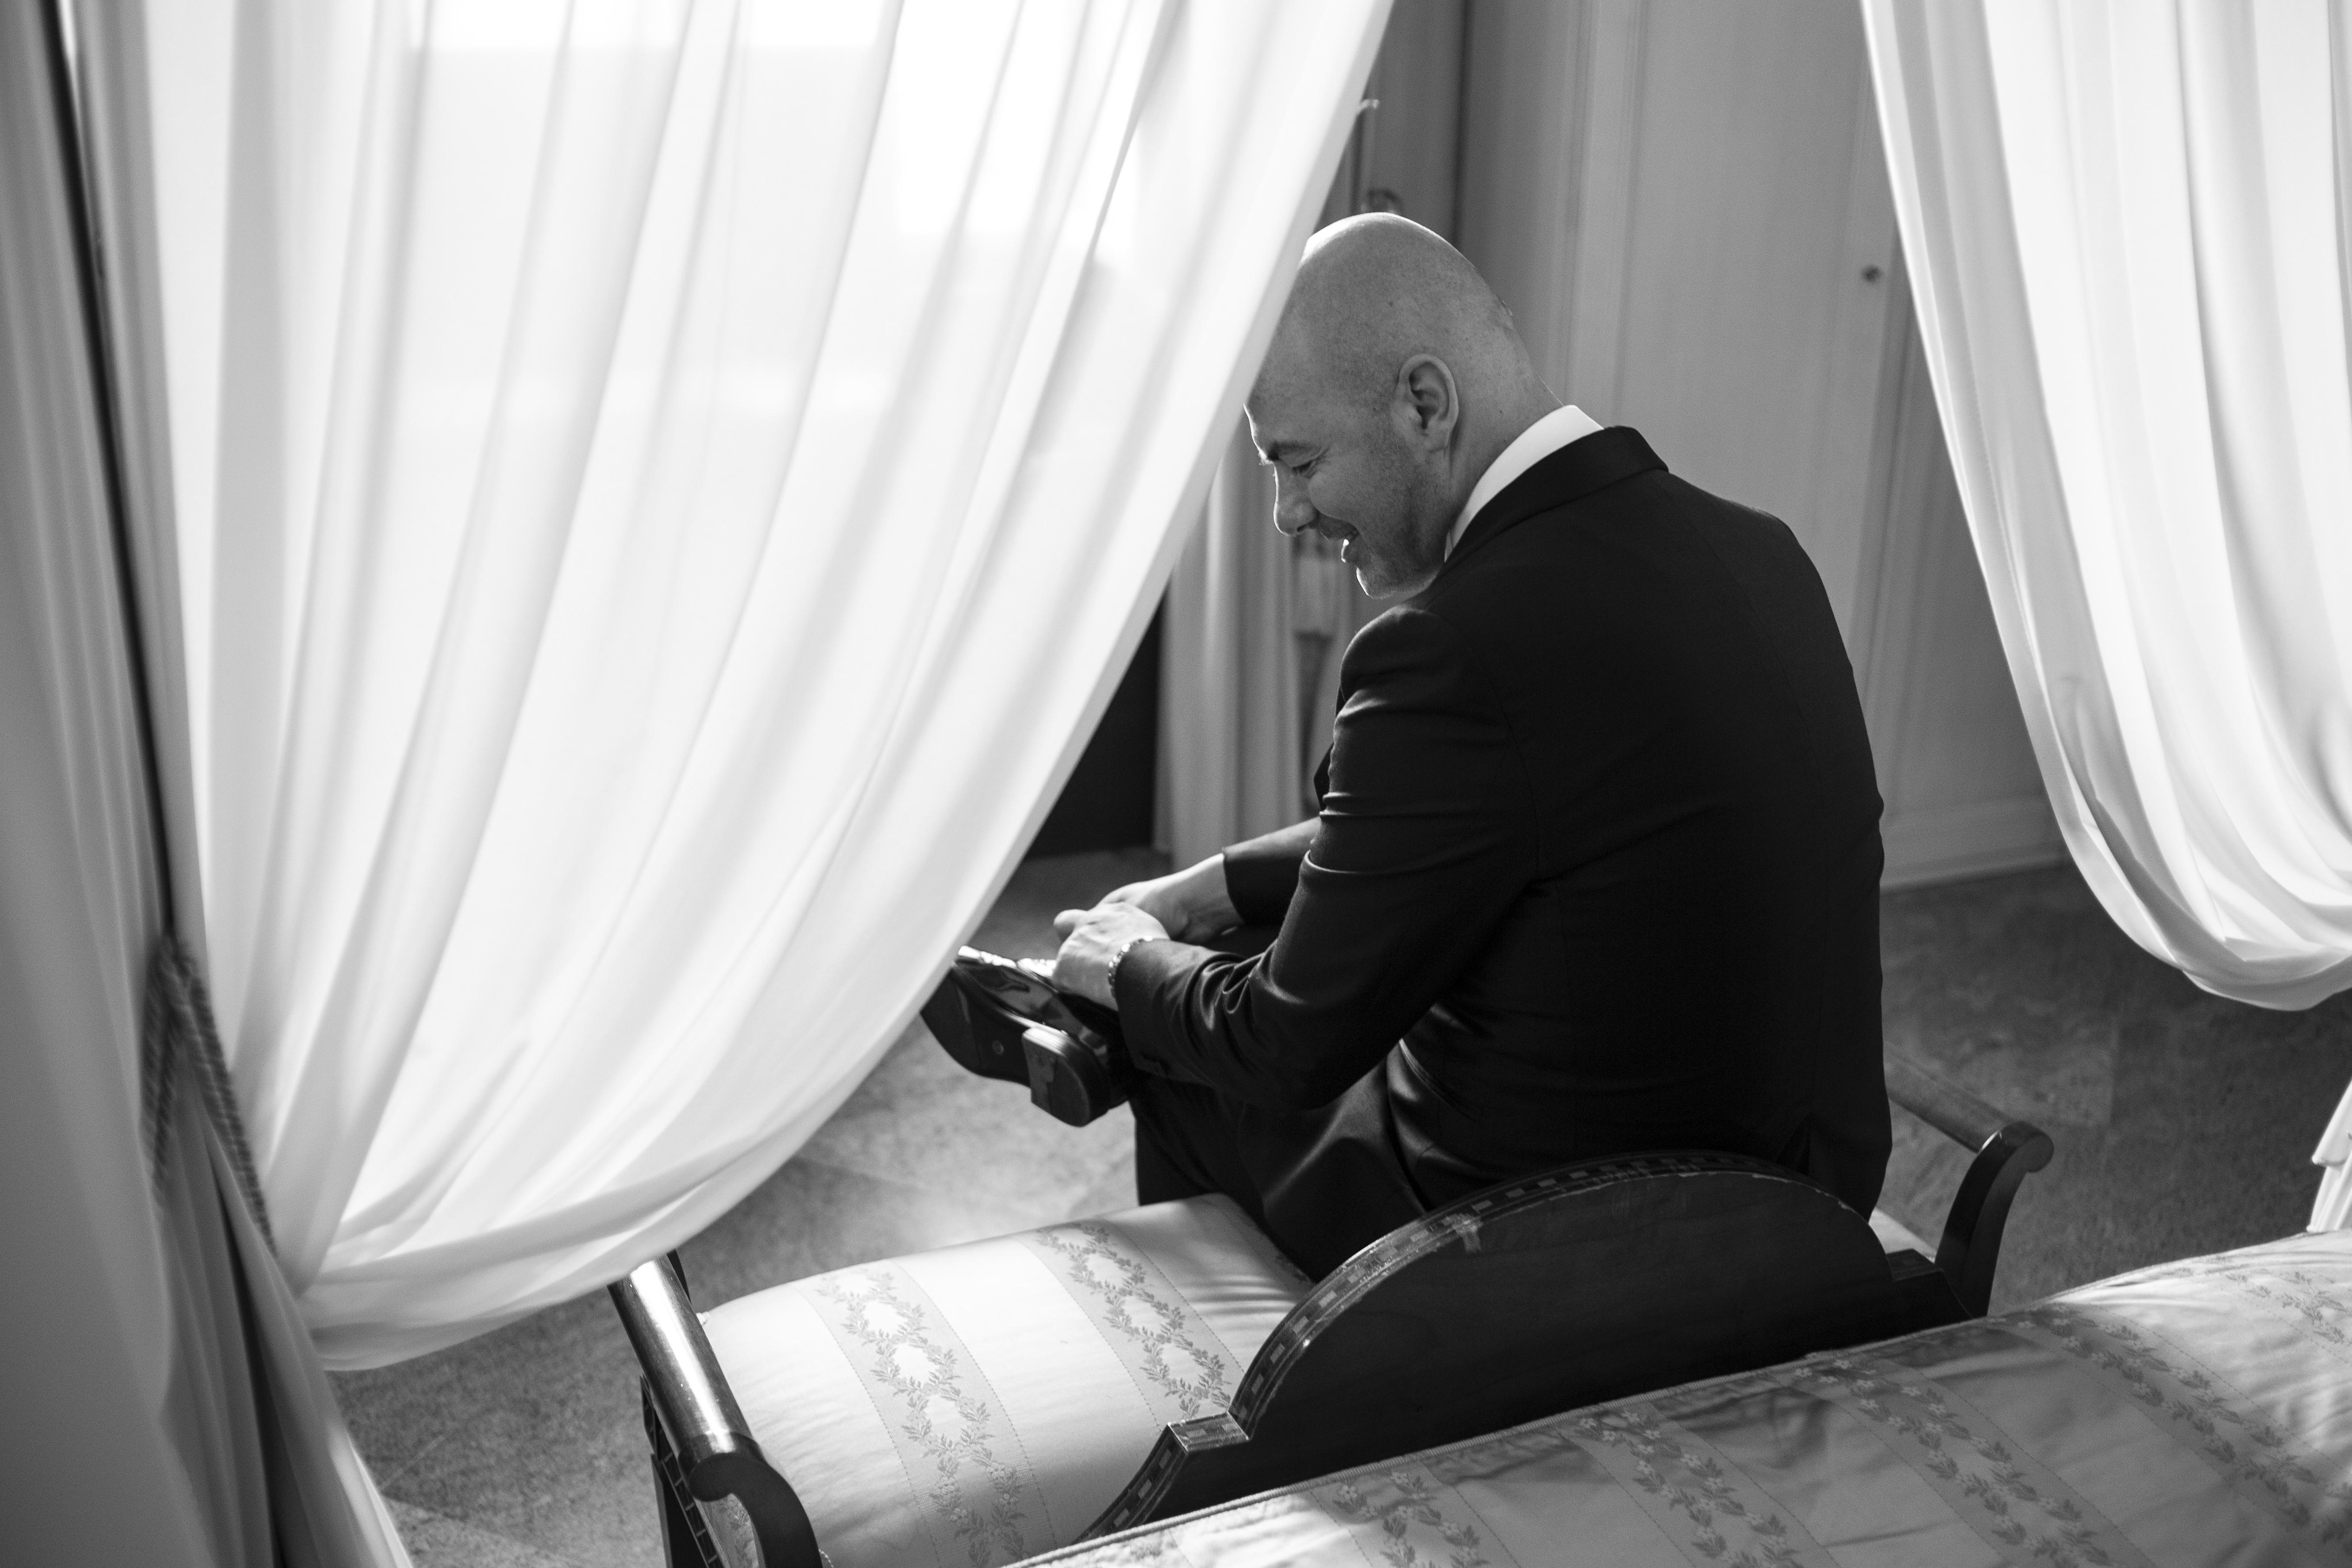 Sposi in campania, studio fotografico osta, foto matrimonio, fotografi matrimonio, foto matrimonio napoli, foto matrimonio campania, album di nozze, sposi napoli, fotografo matrimonio, servizio fotografico matrimonio, servizio fotografico matrimonio Campania, studio fotografico matrimonio